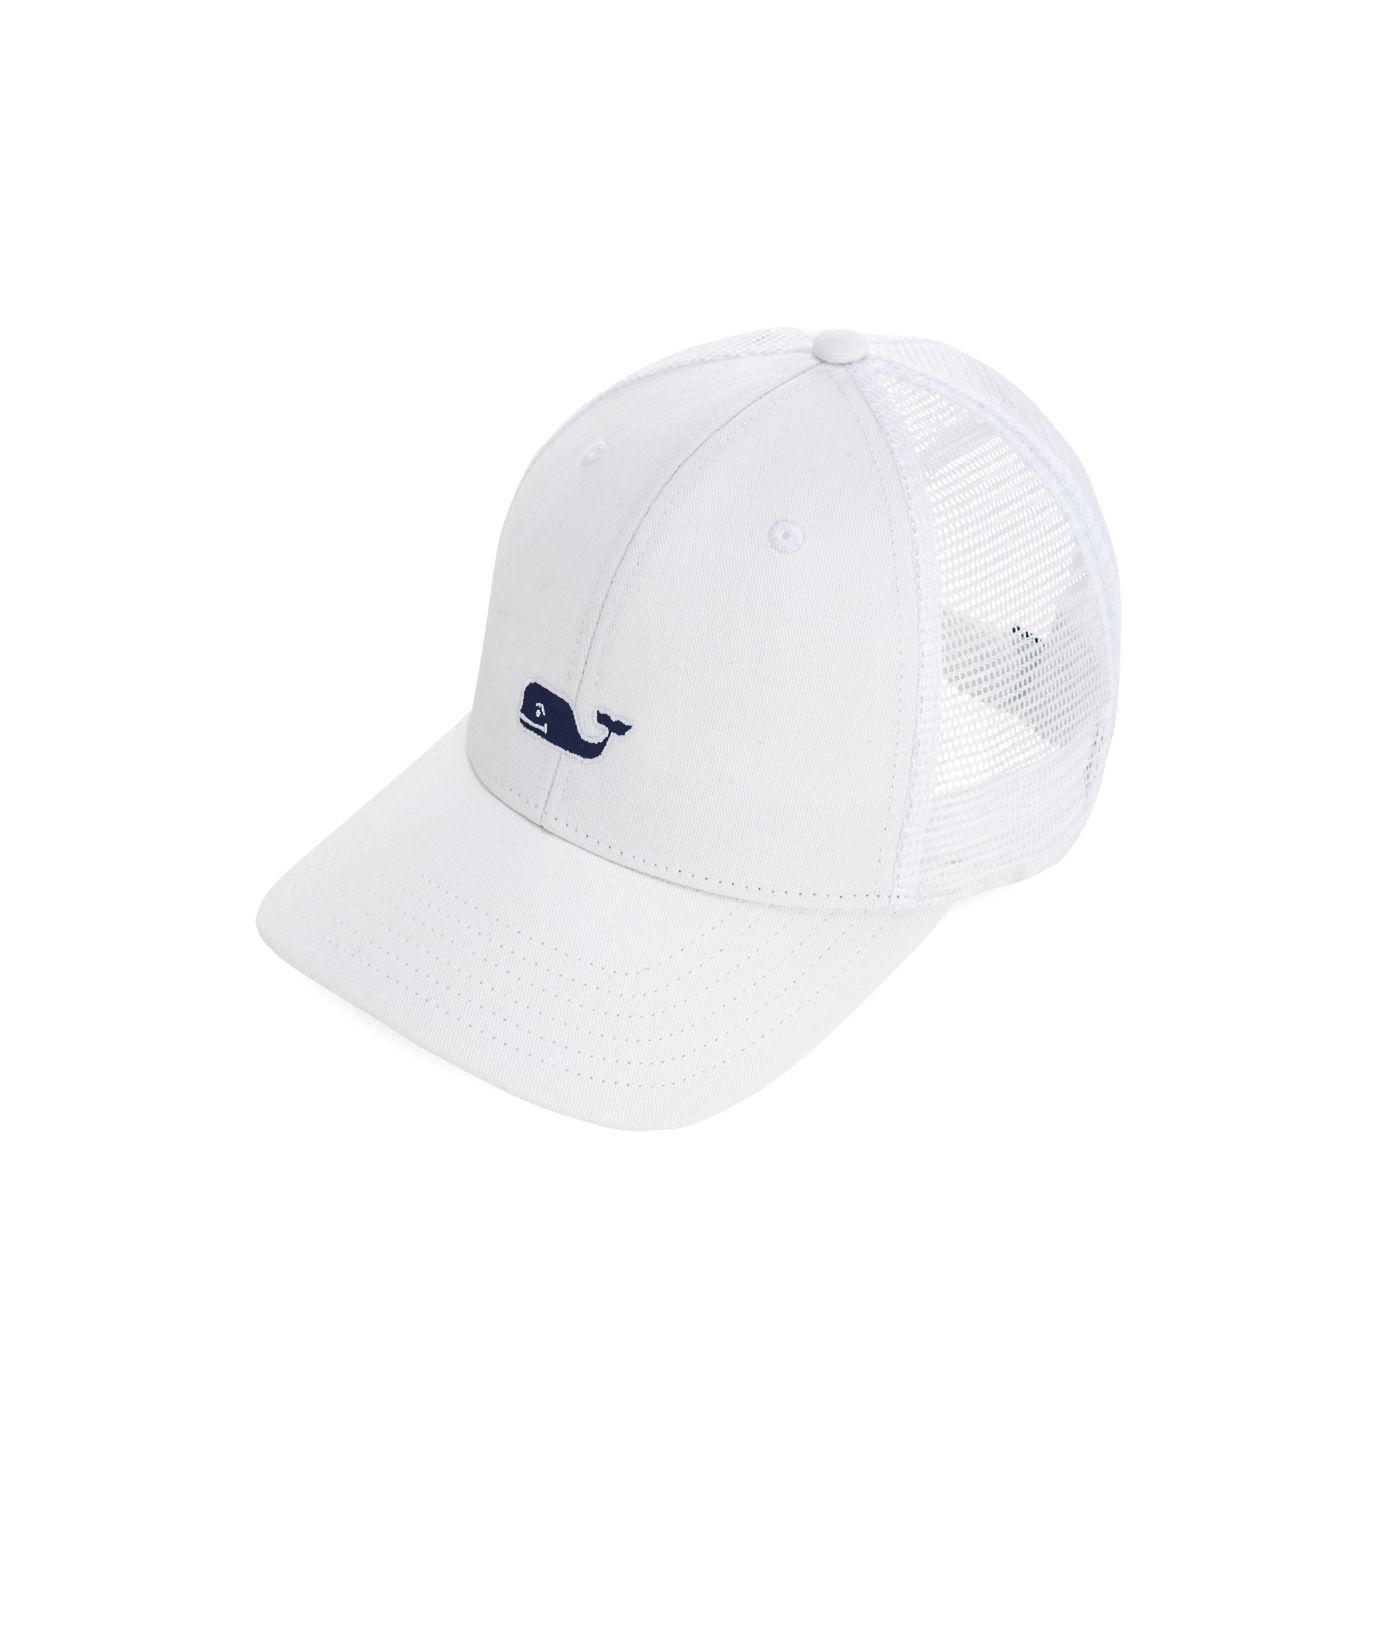 a9060f7c4330c Lyst - Vineyard Vines High Profile Whale Logo Trucker Hat in White ...